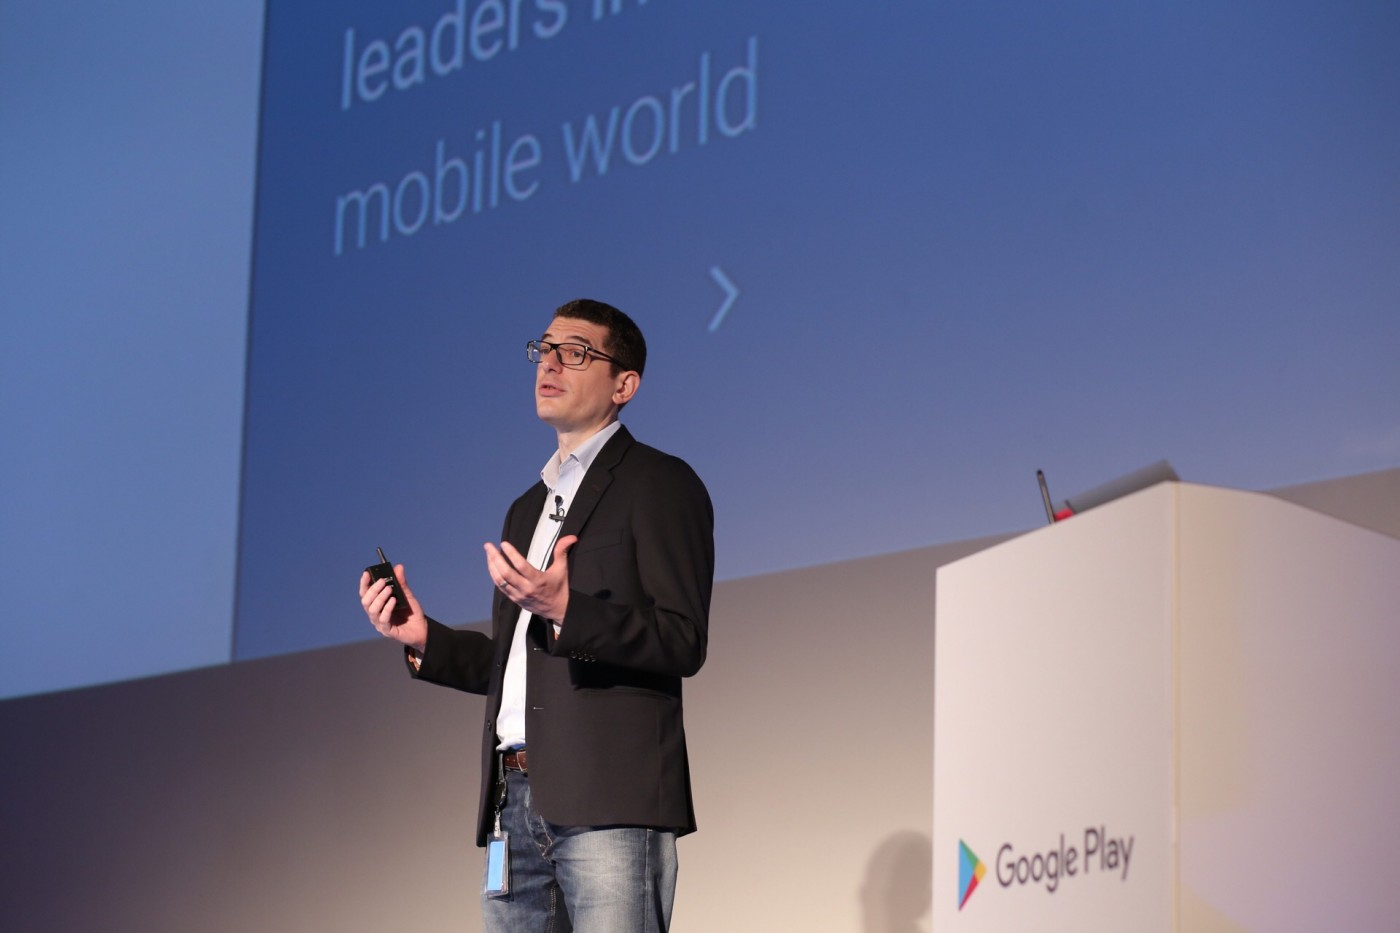 Google Play發警訊!過半台灣開發者靠自學,外界資源嚴重不足